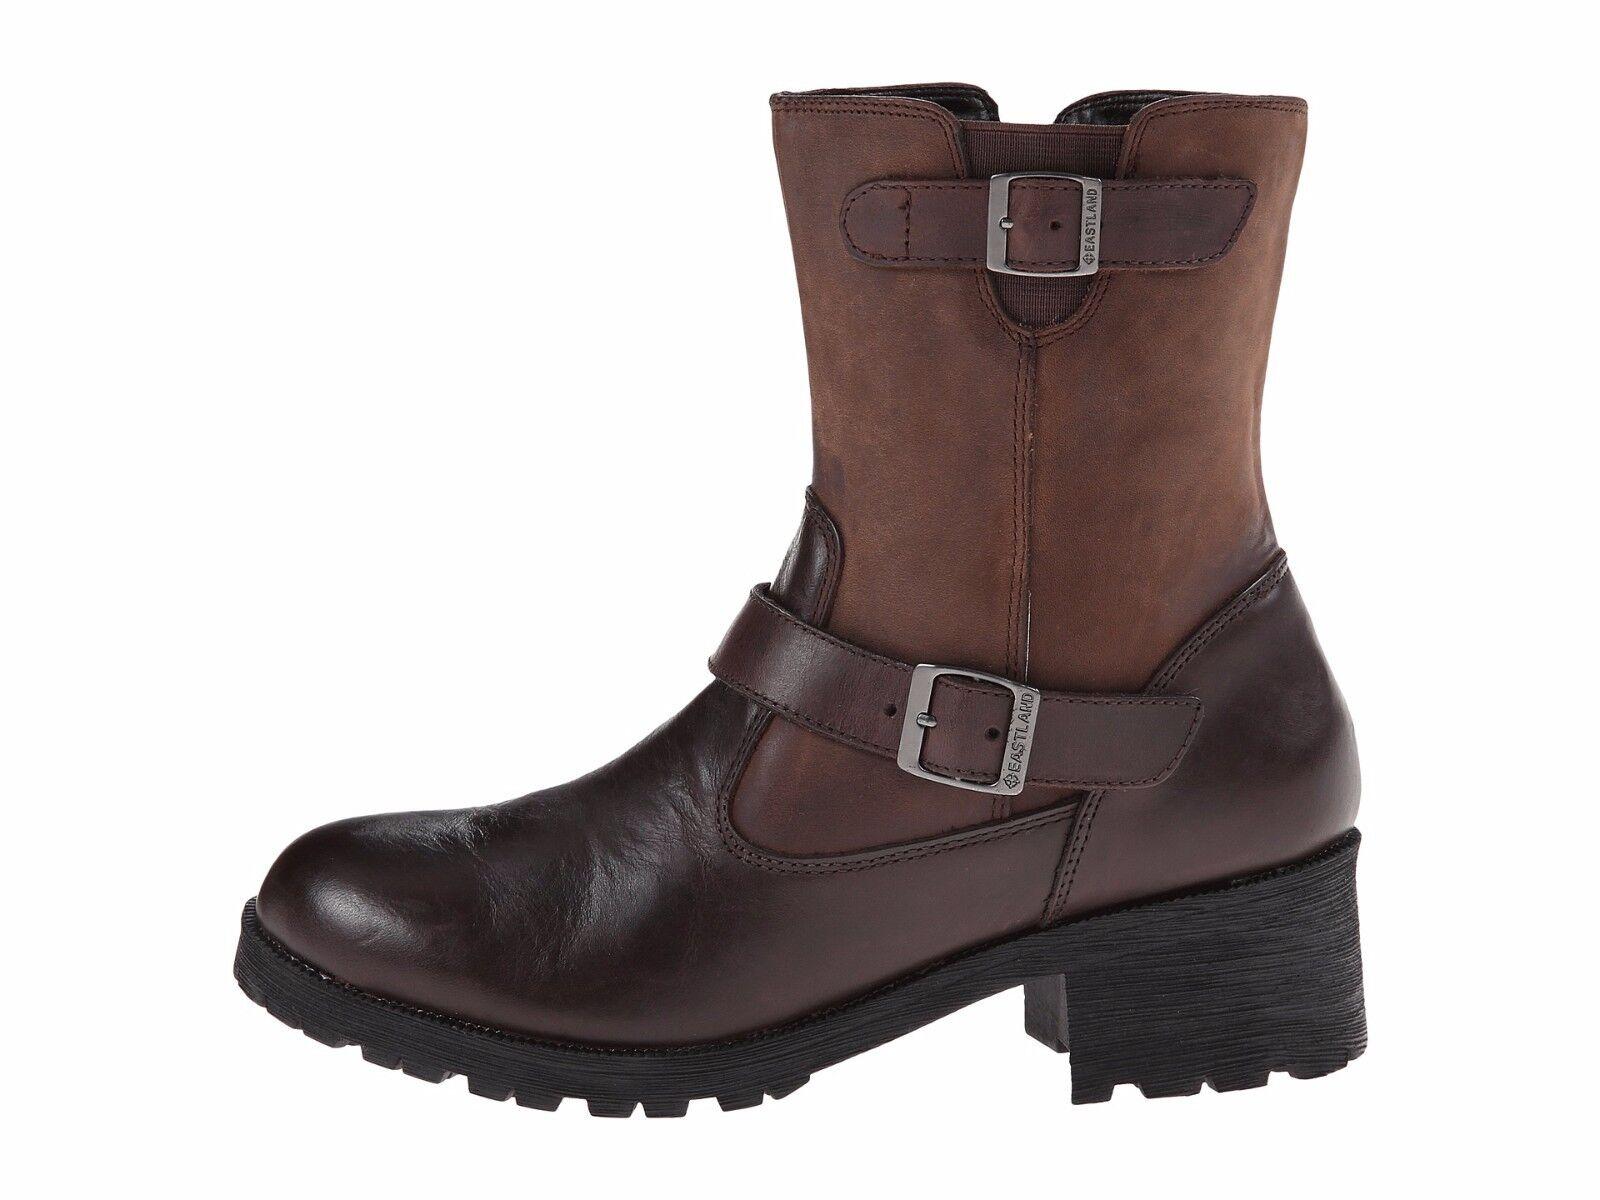 NEU Eastland Belmont Leder Damens's boots Größe 7.5